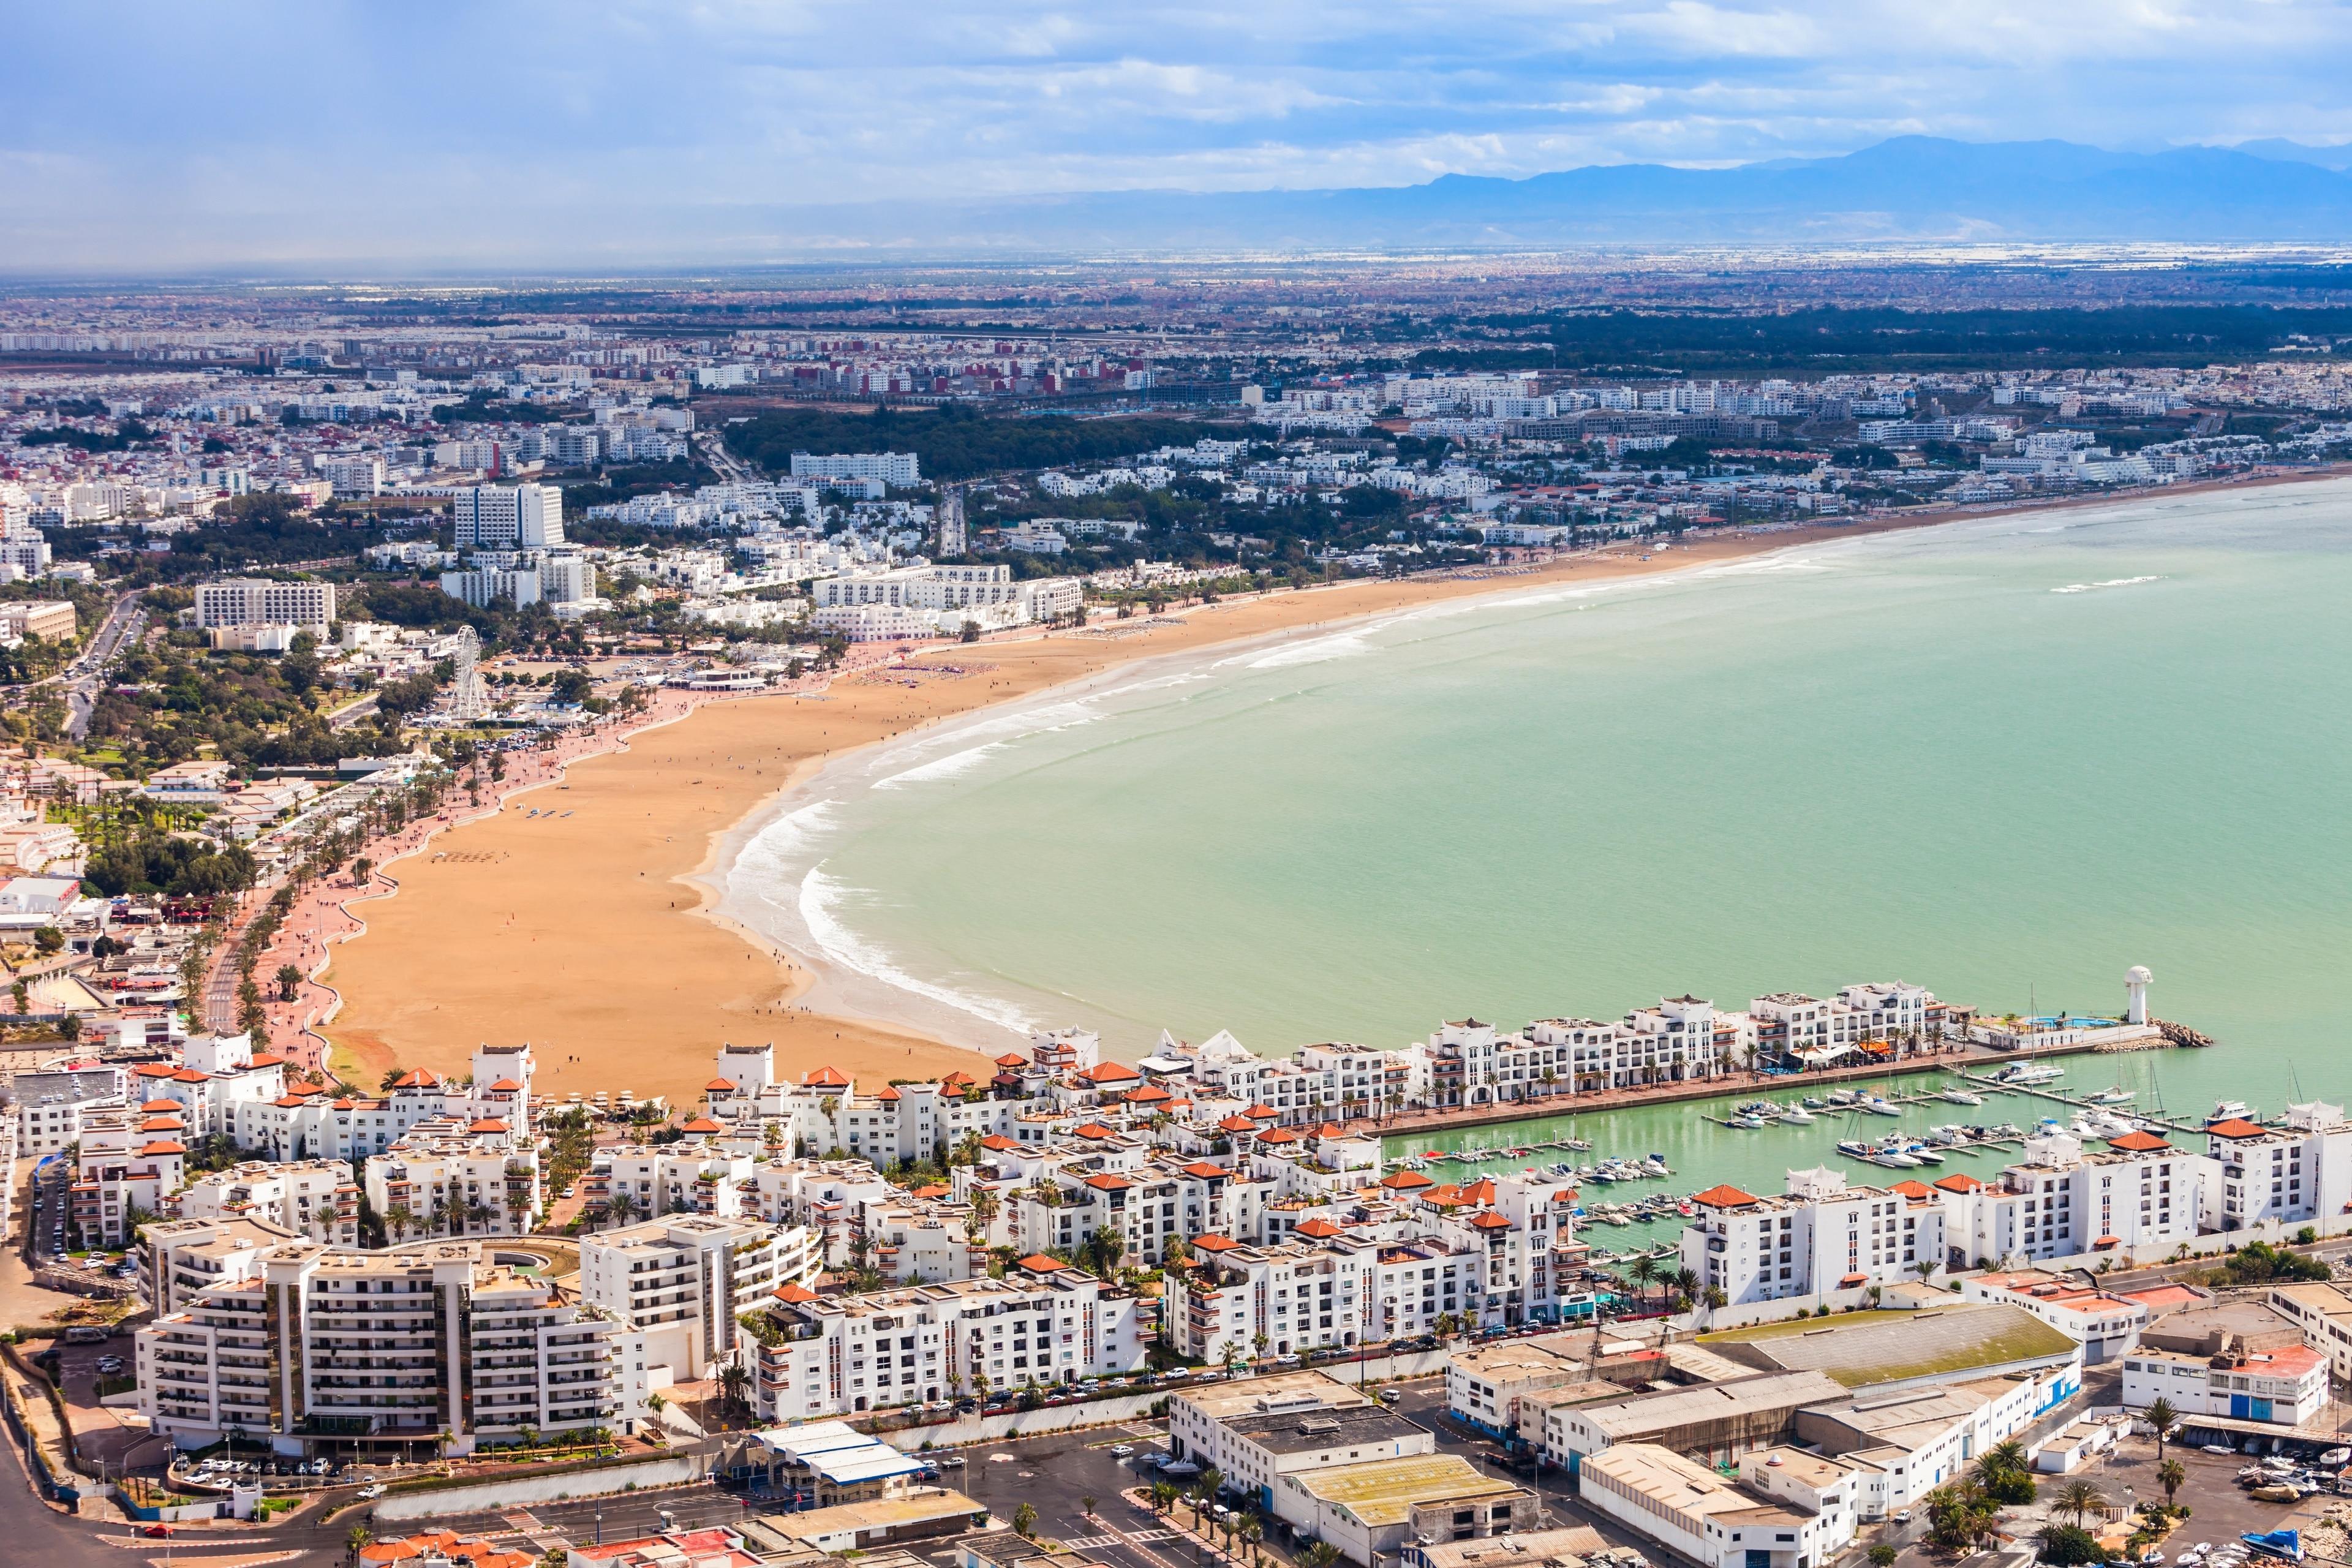 Strand von Agadir, Agadir, Souss-Massa, Marokko